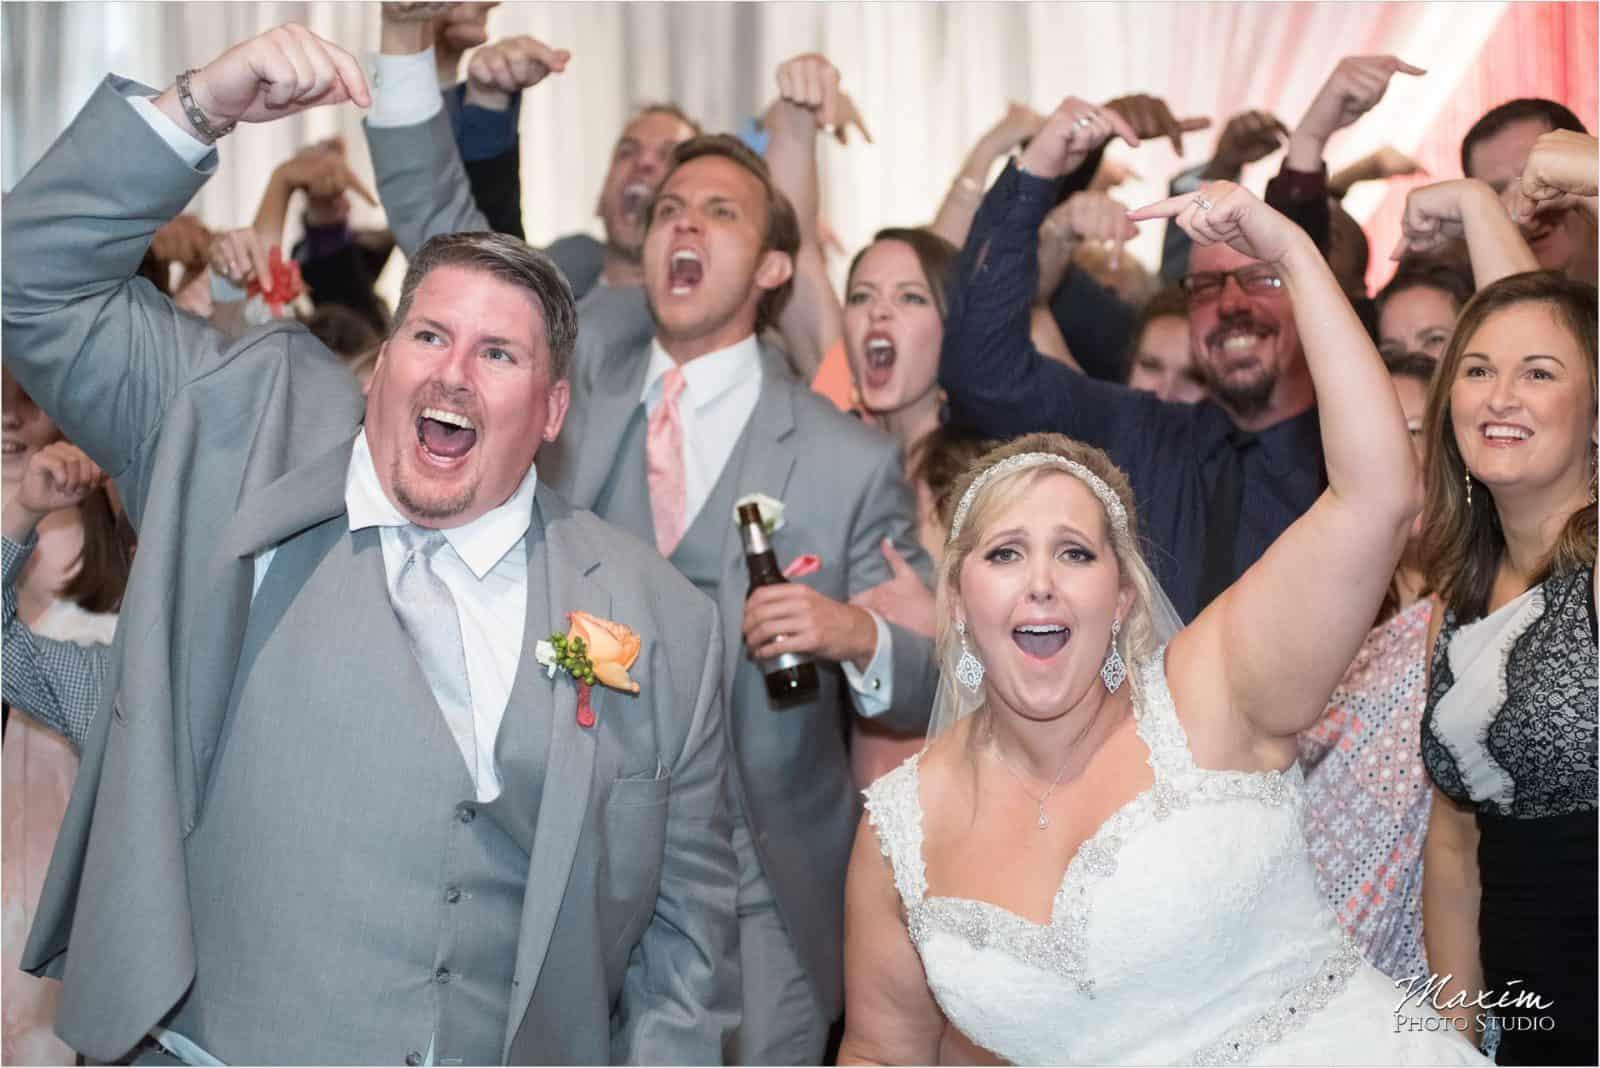 Top of the Market Dayton Ohio Wedding Reception group Photo